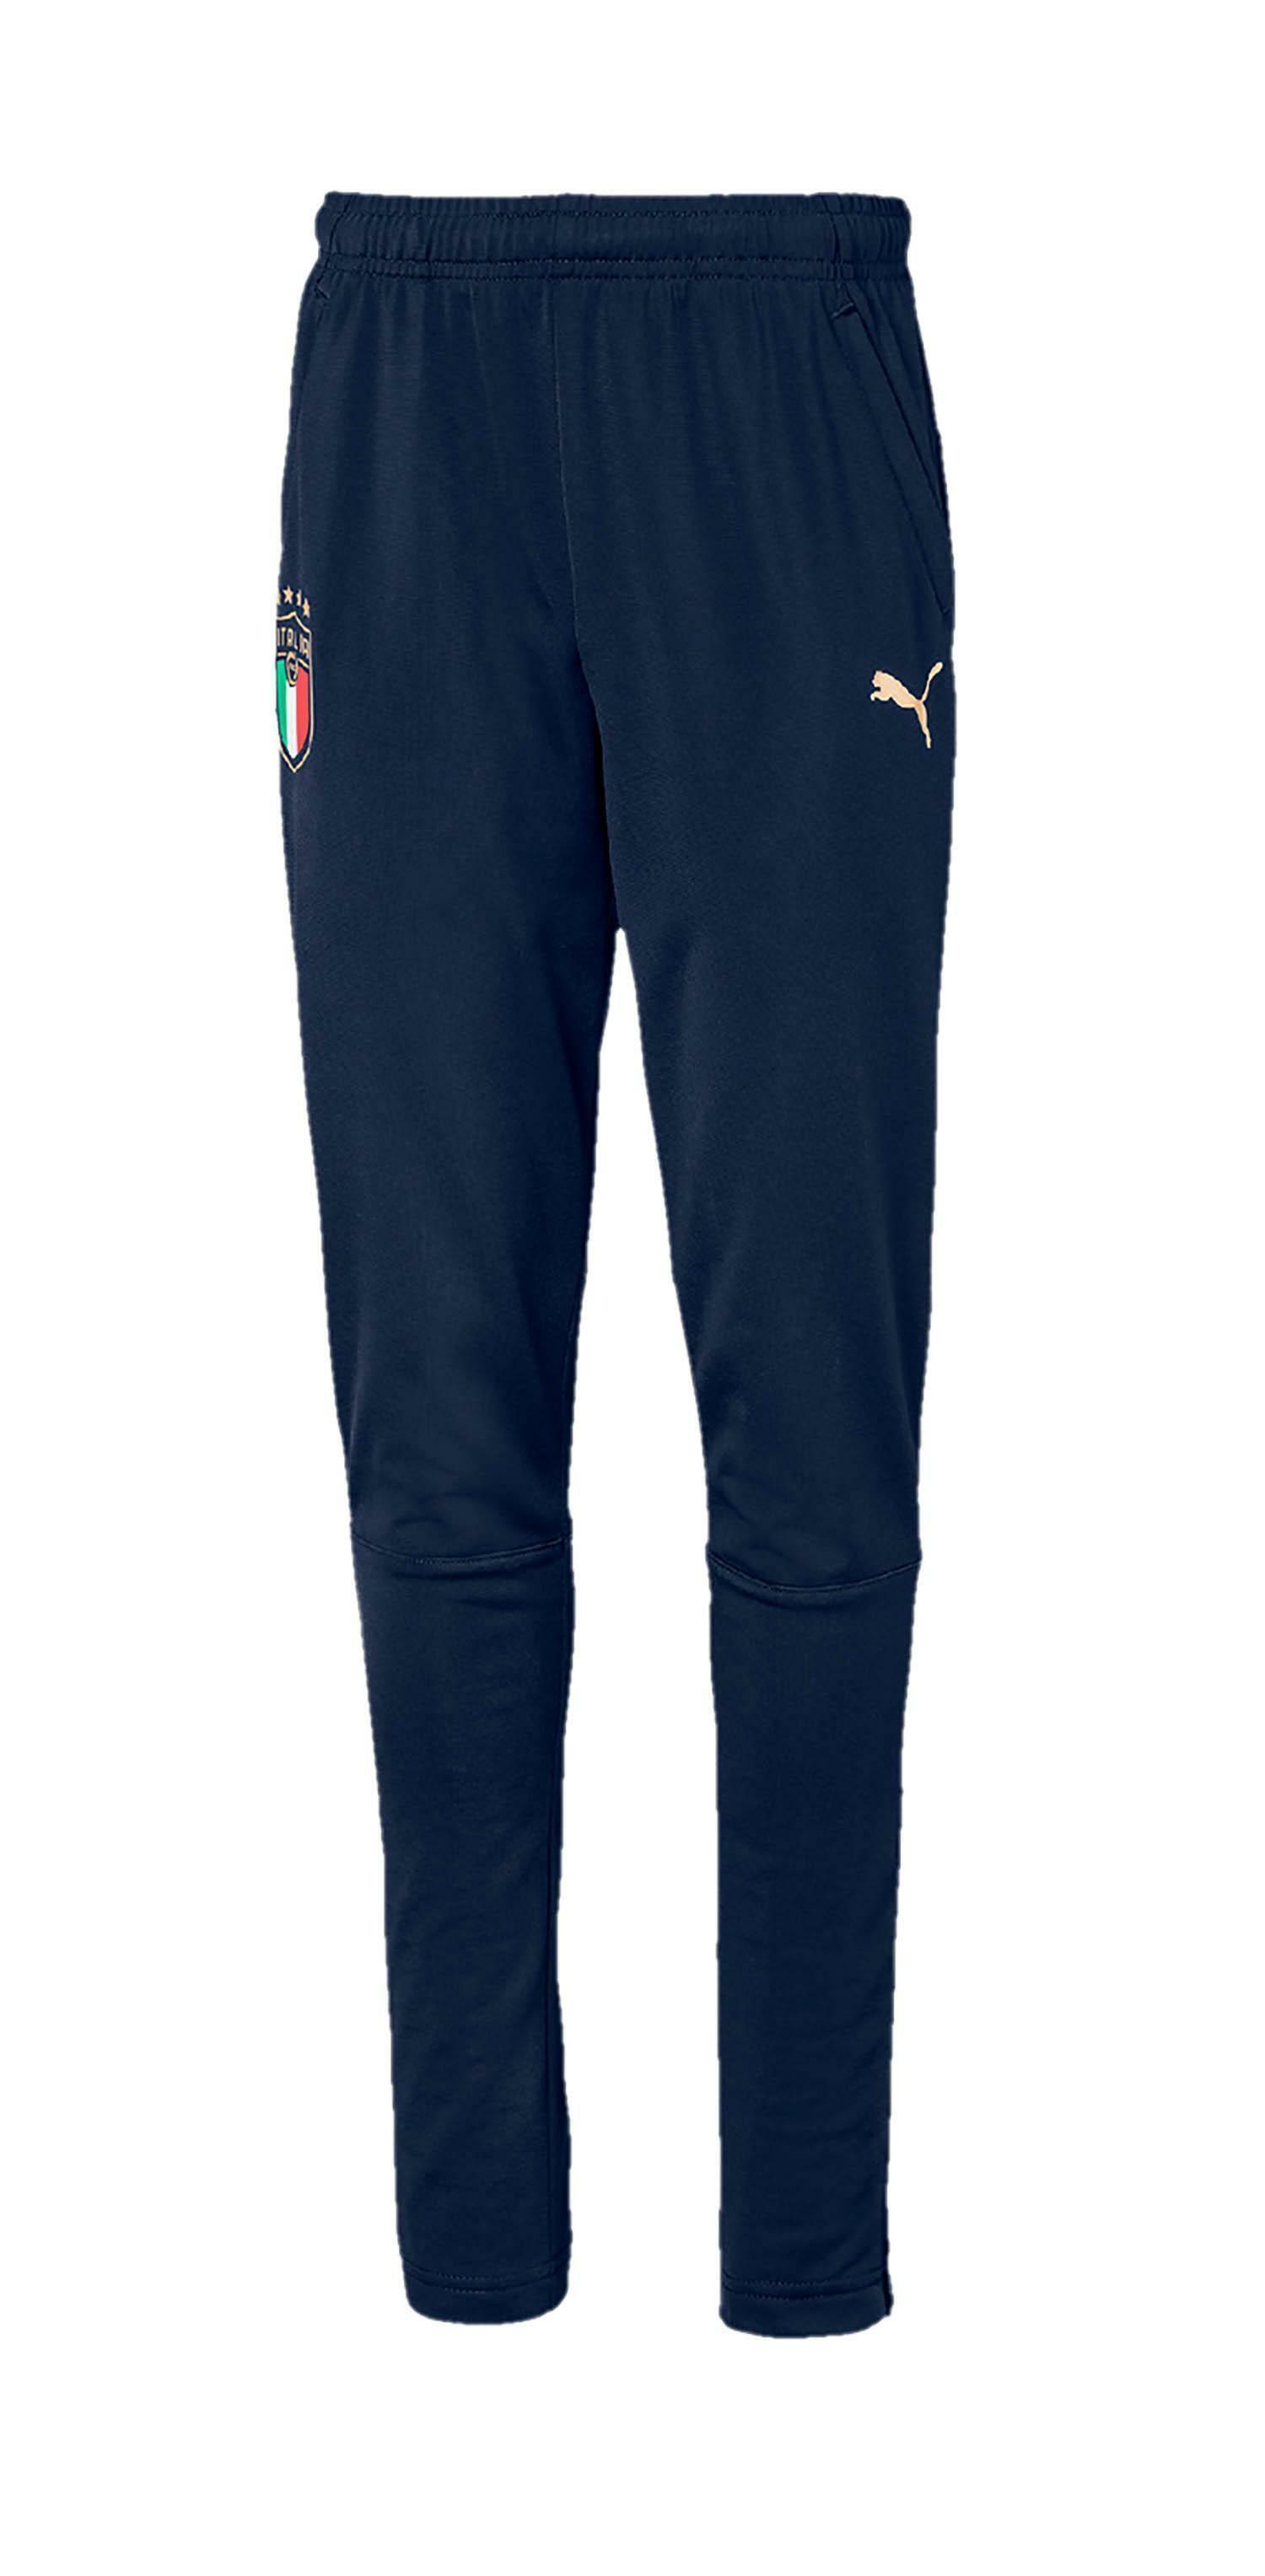 puma puma italia nazionale figc pantalone bambino